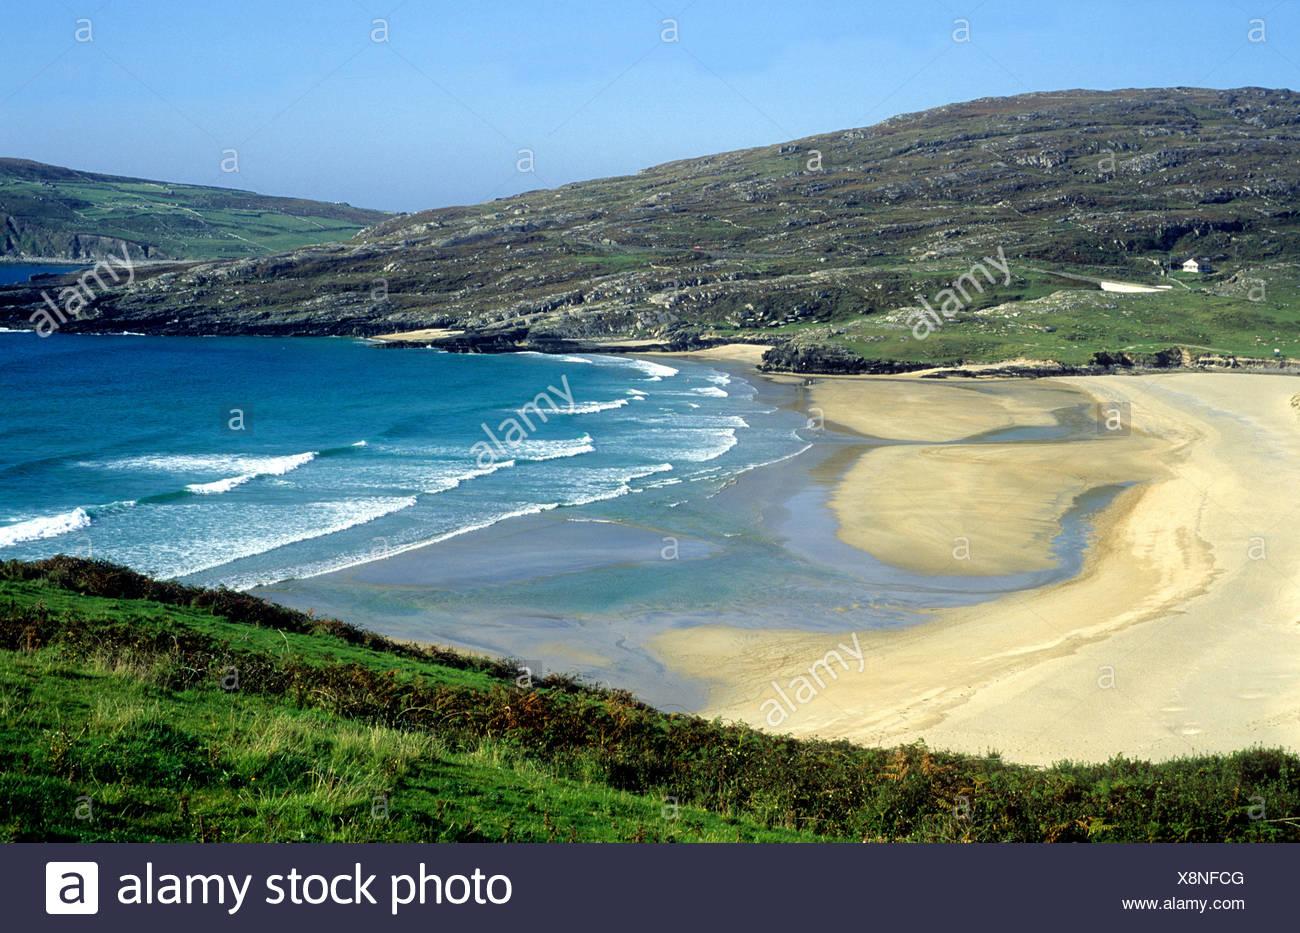 Barleycove Beach, County Cork, Ireland Eire Irish beaches coast coastal scenery sea sand waves - Stock Image